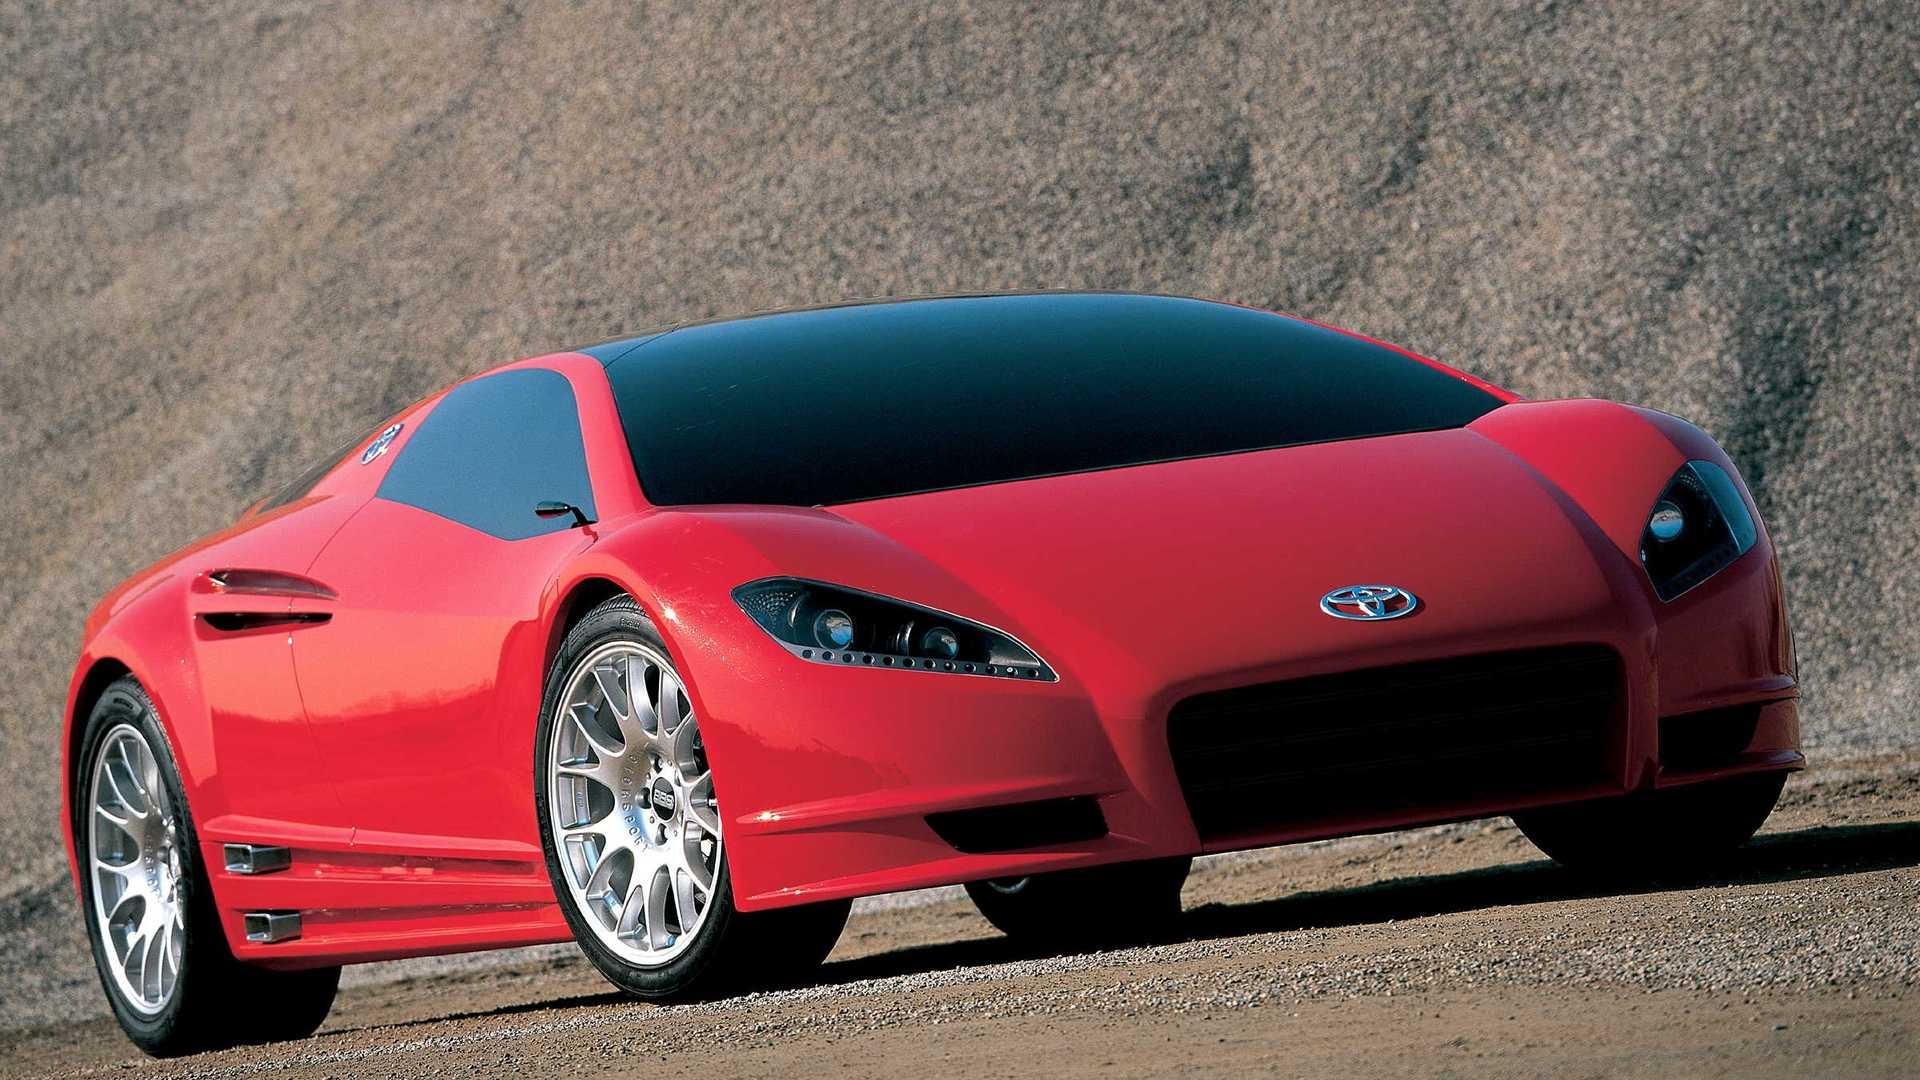 Toyota-Alessandro-Volta-concept-2004-2